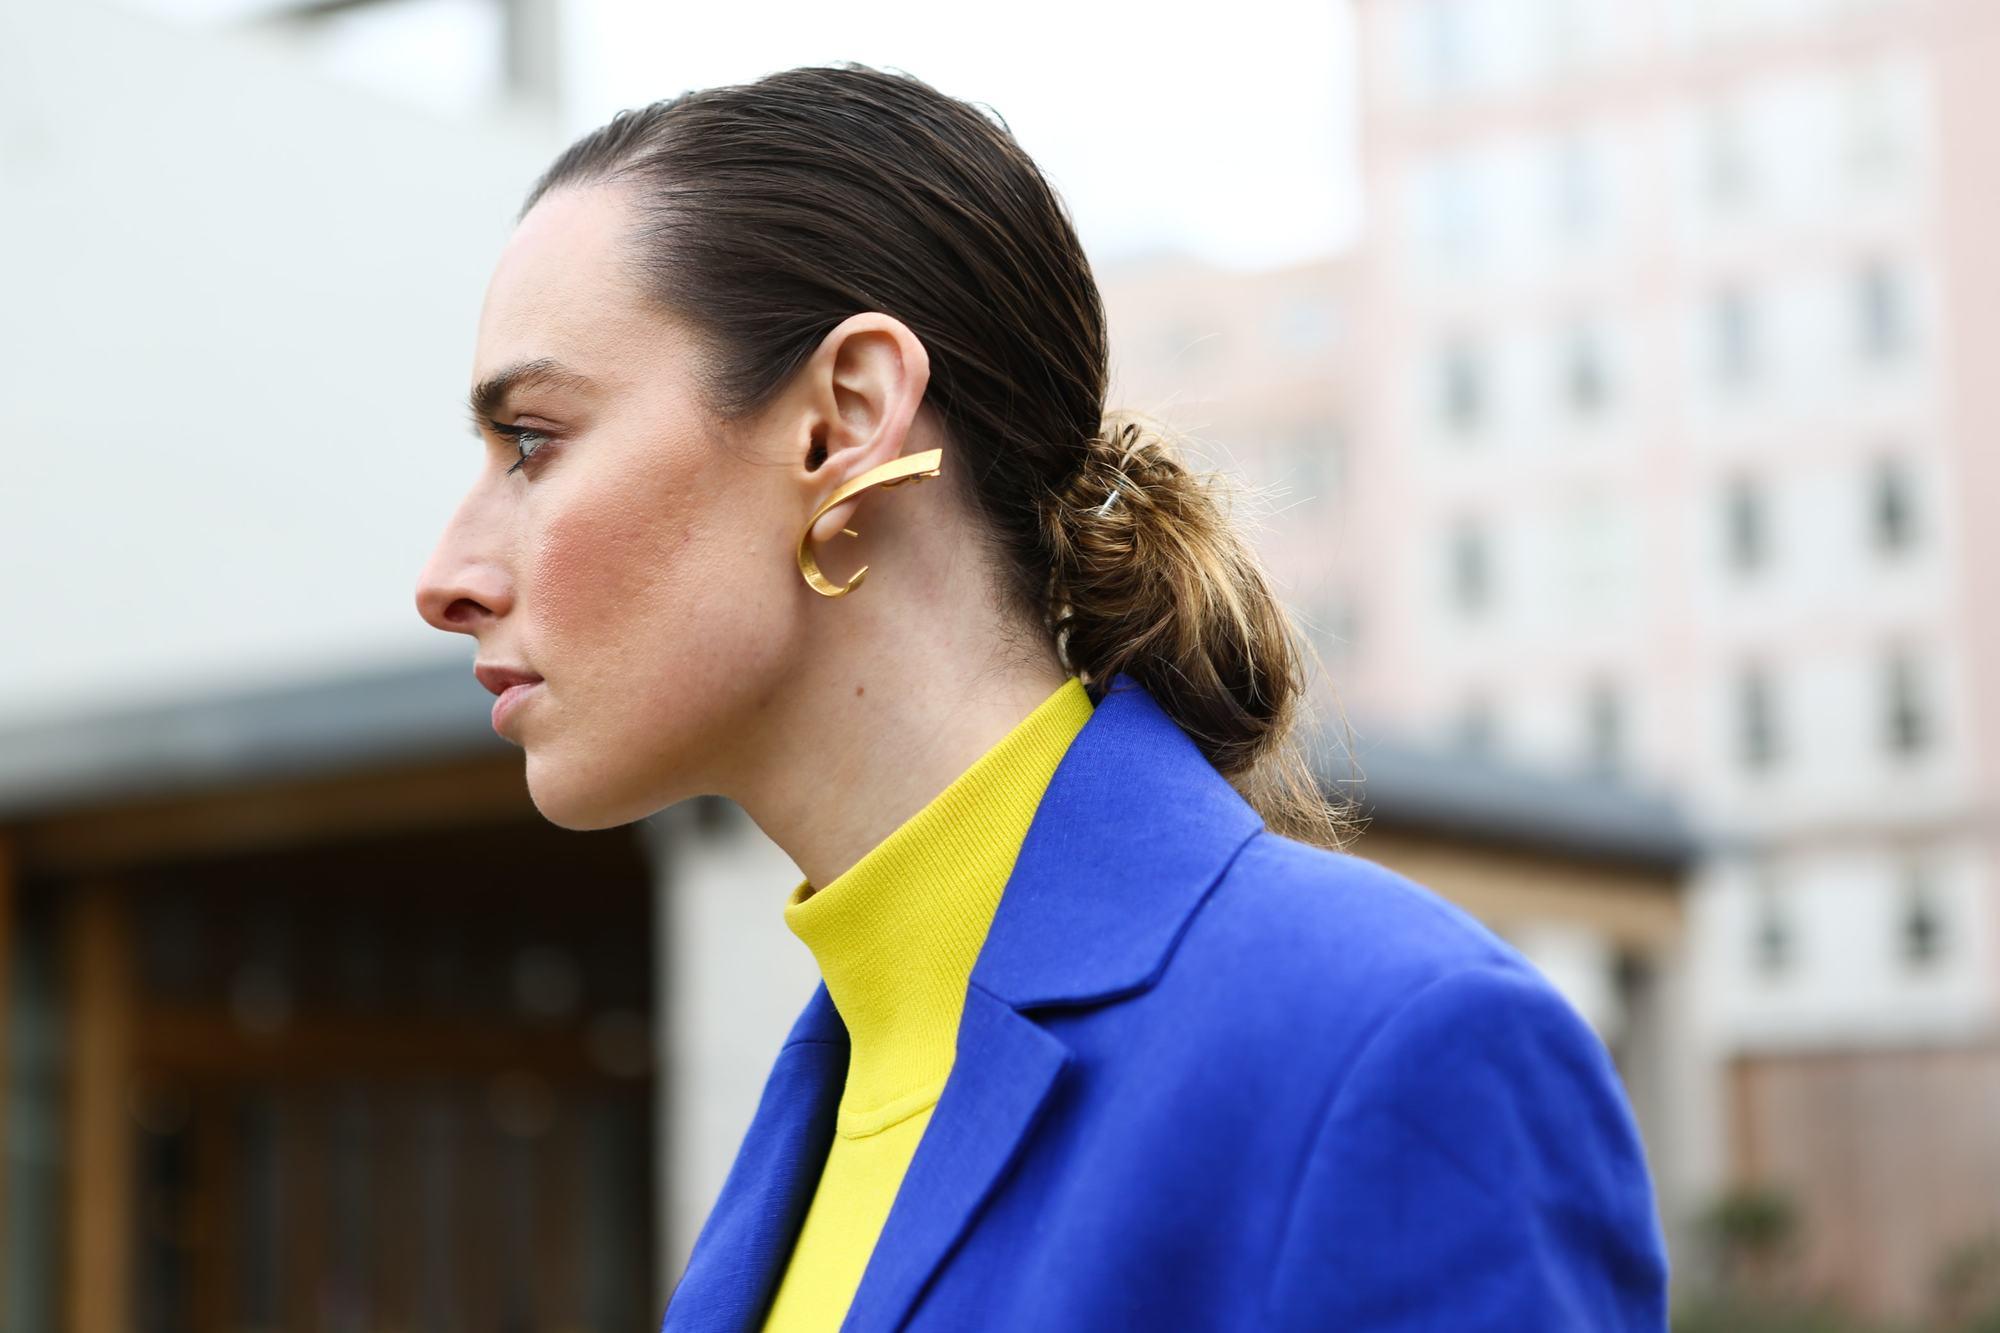 Side profile of brunette woman with low bun outside